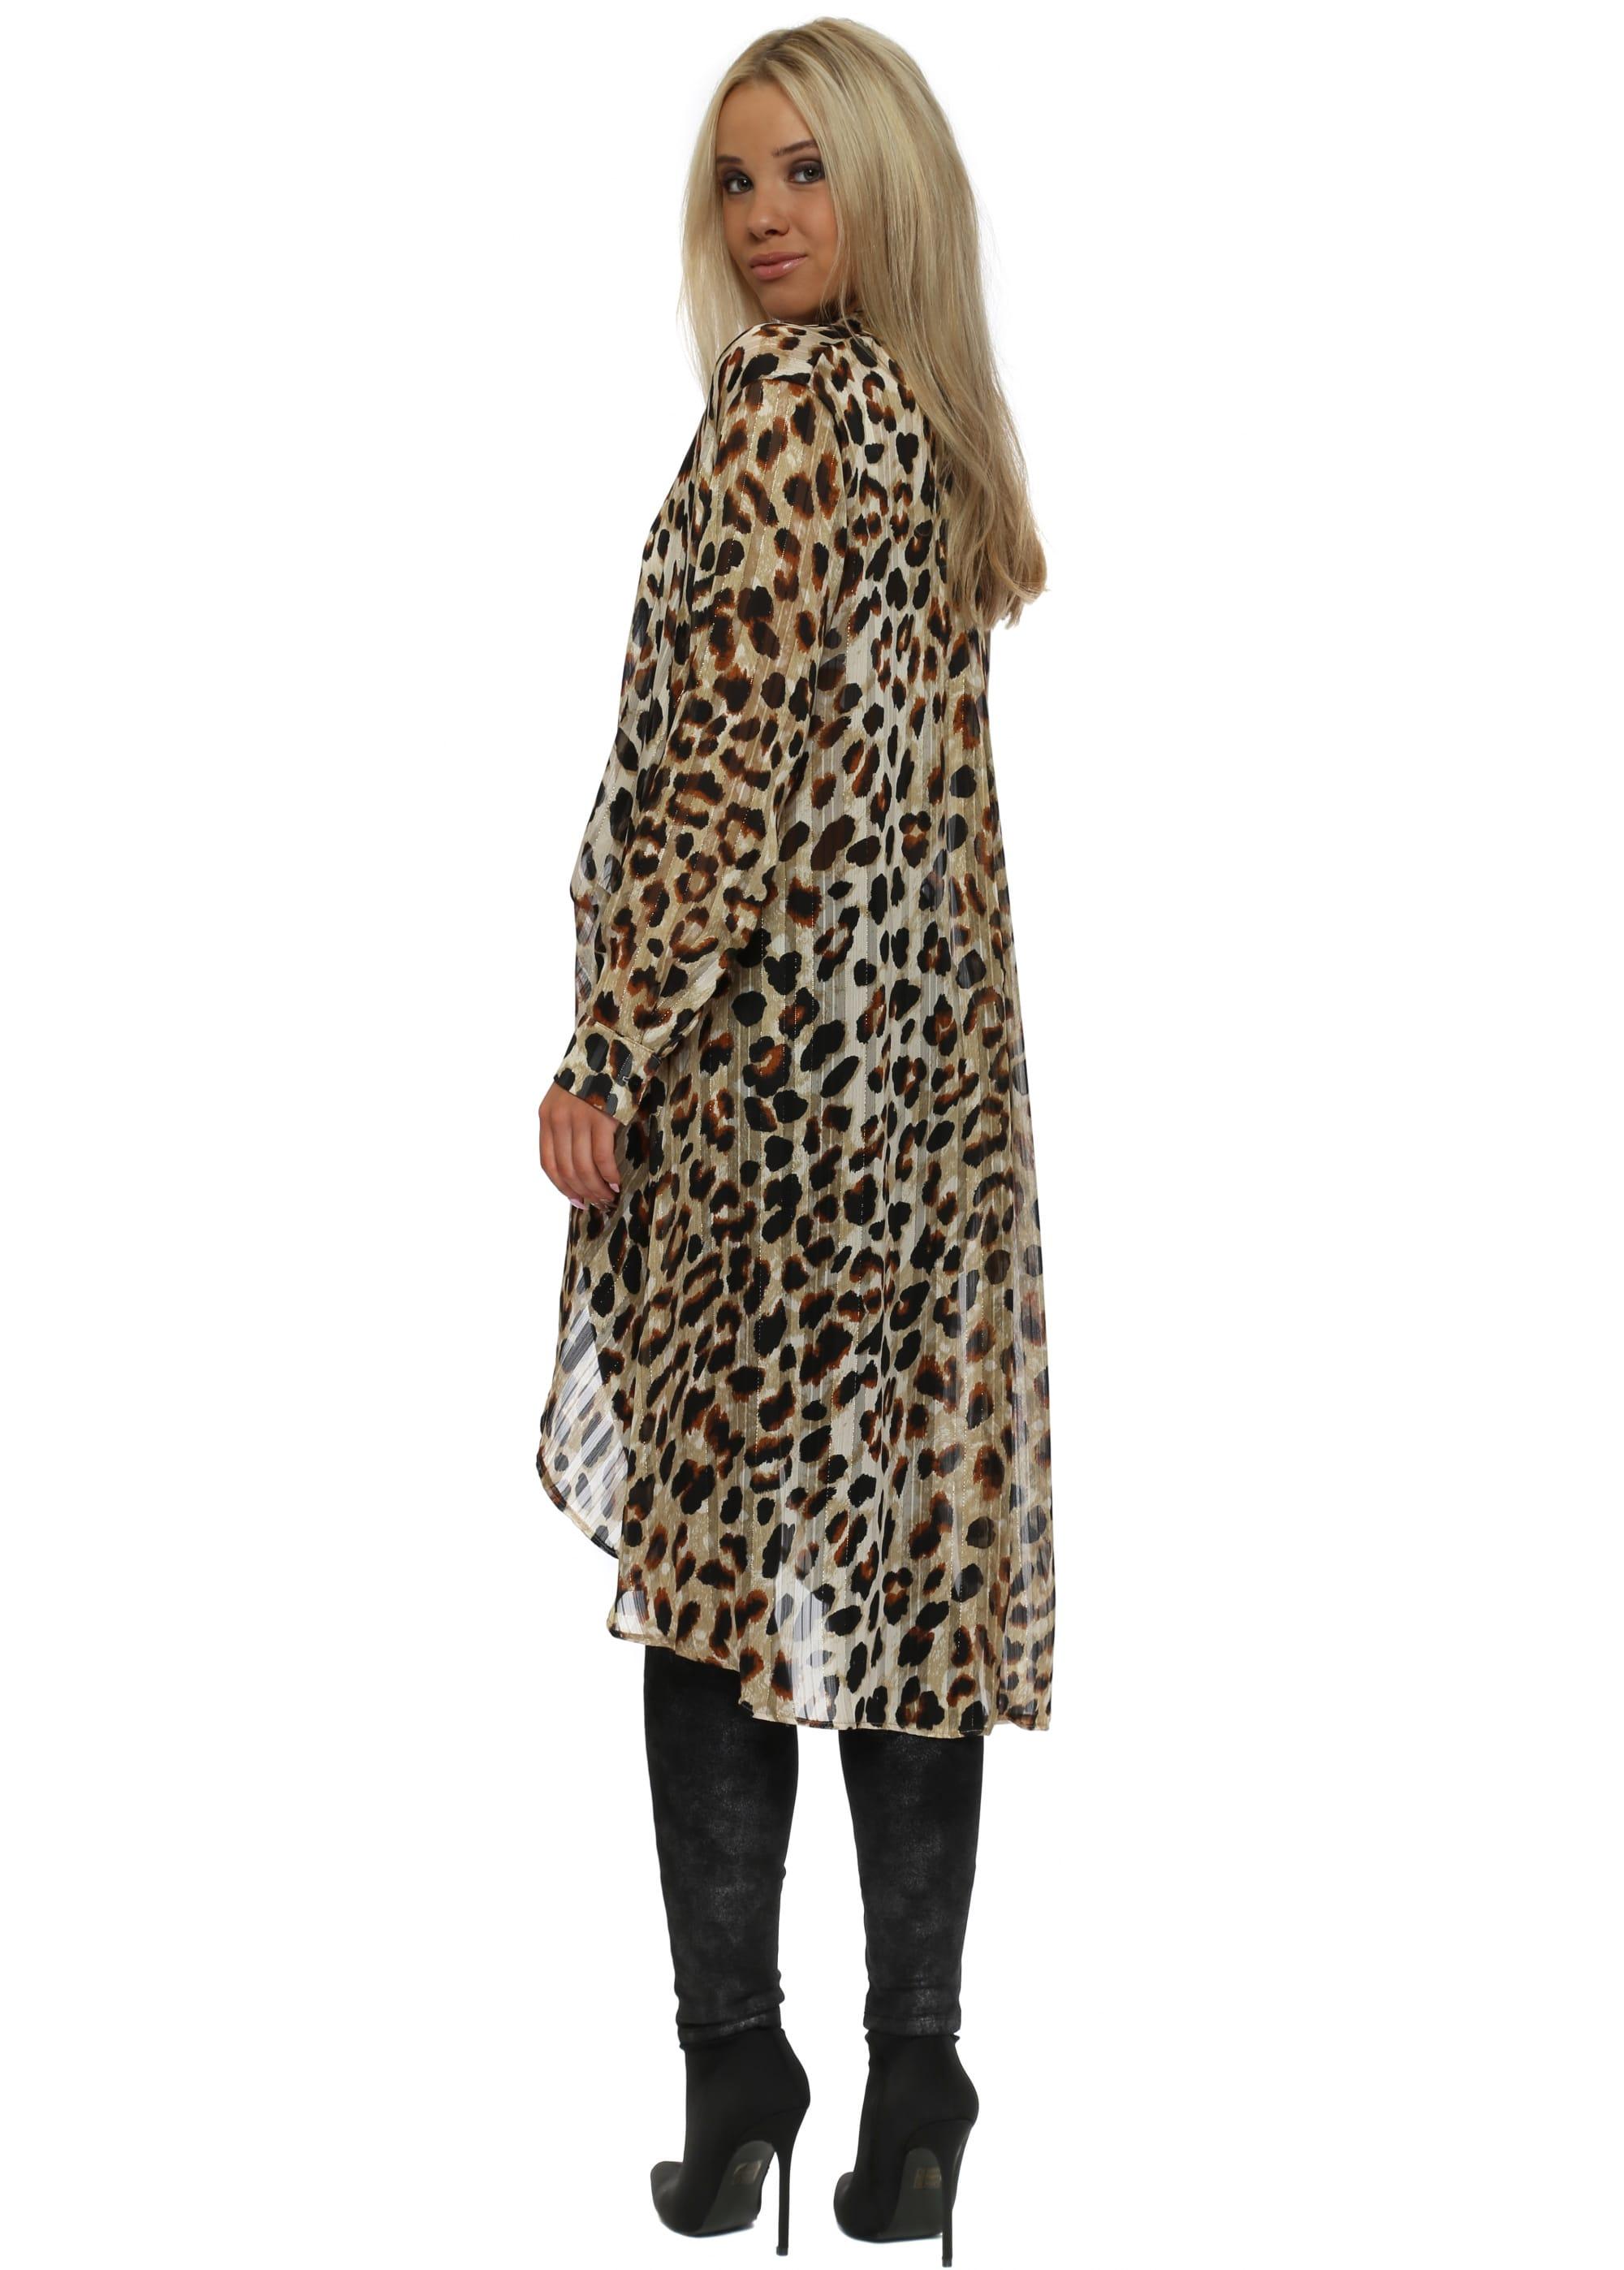 2eadf06f1caa Leopard Print High Low Semi Sheer Oversized Shirt